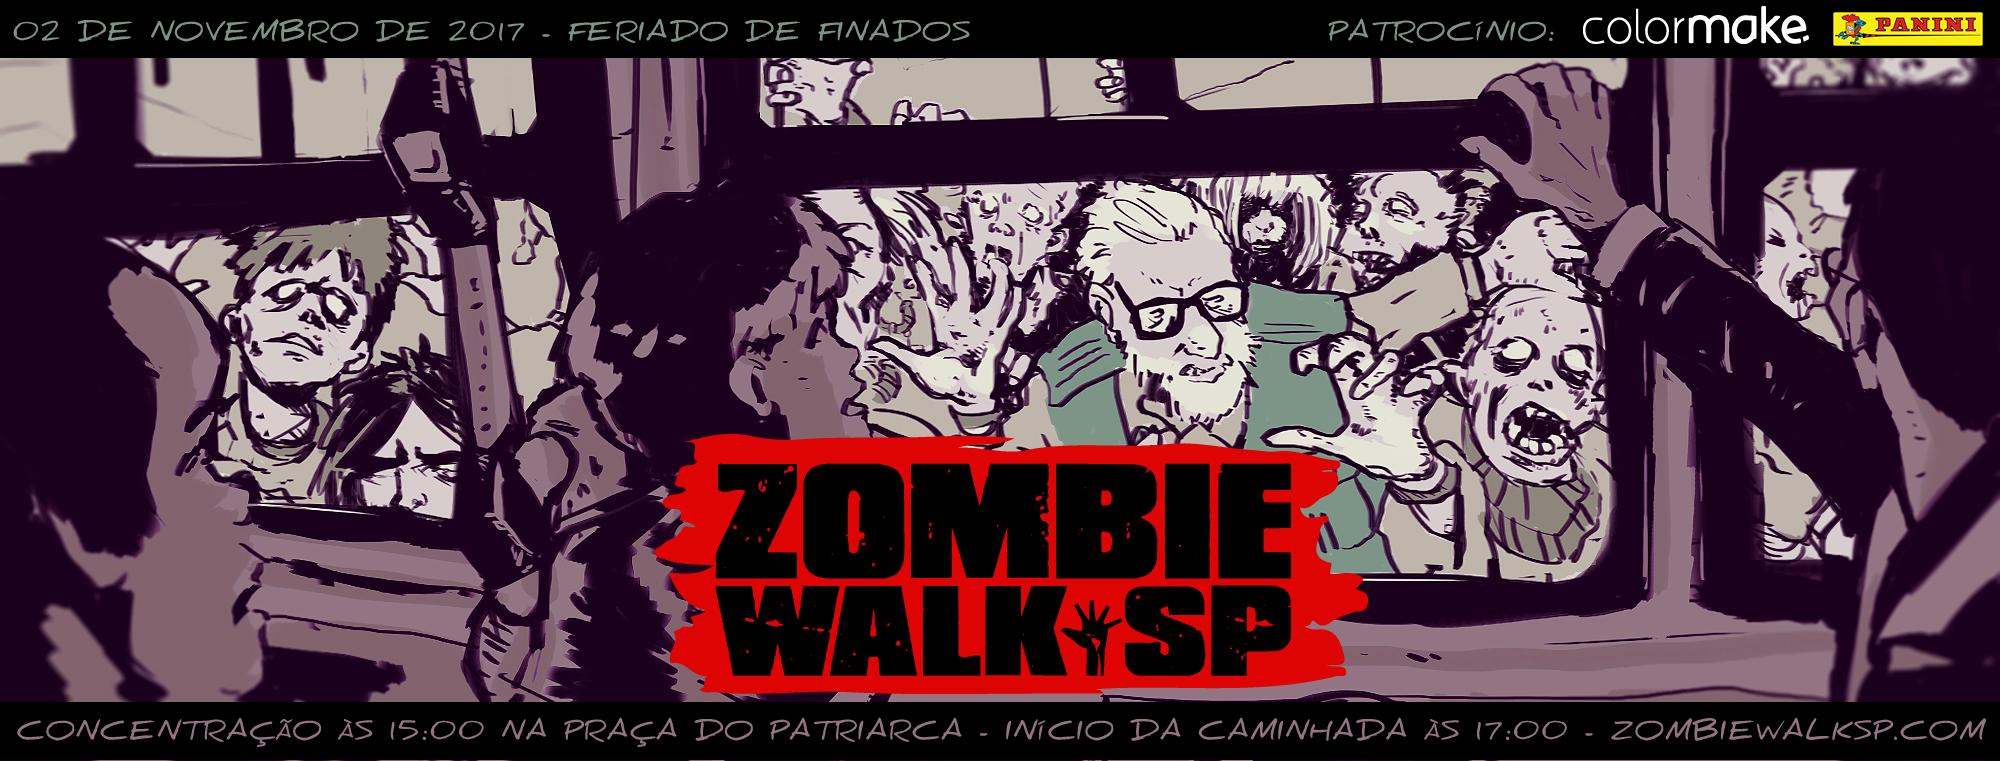 Zombie Walk SP - Flyer 2017